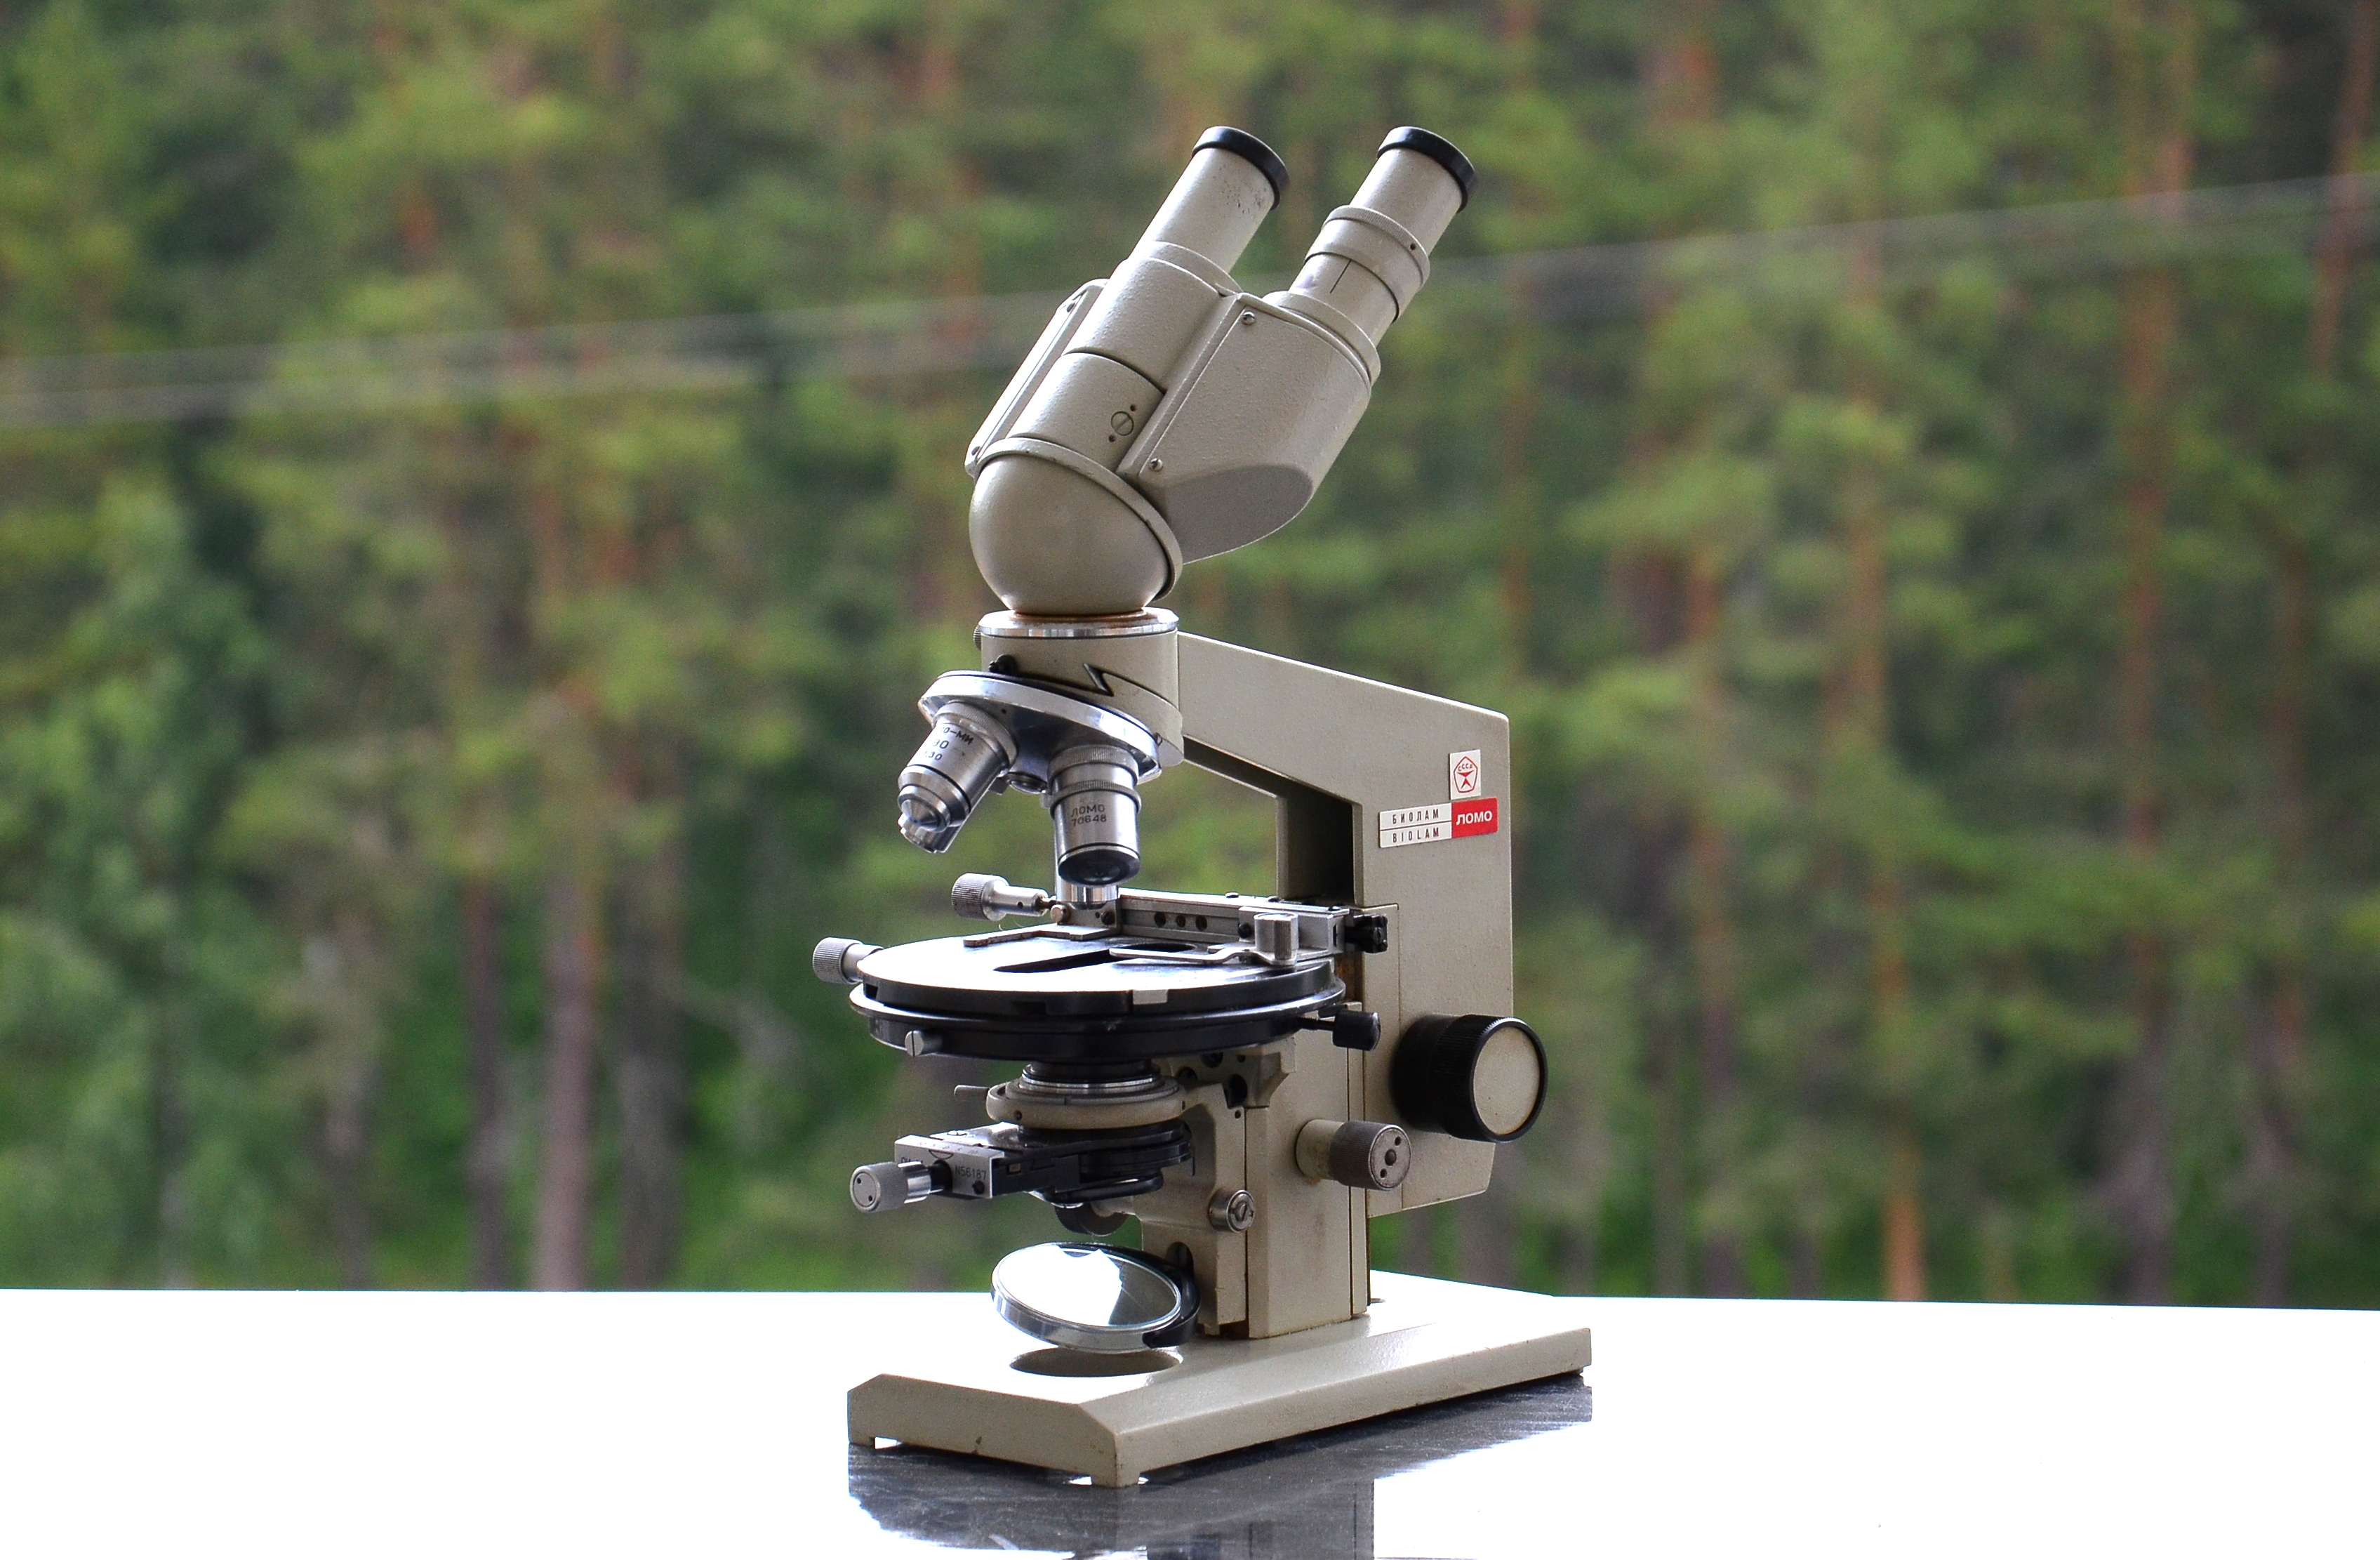 микроскоп биолам р7 фото